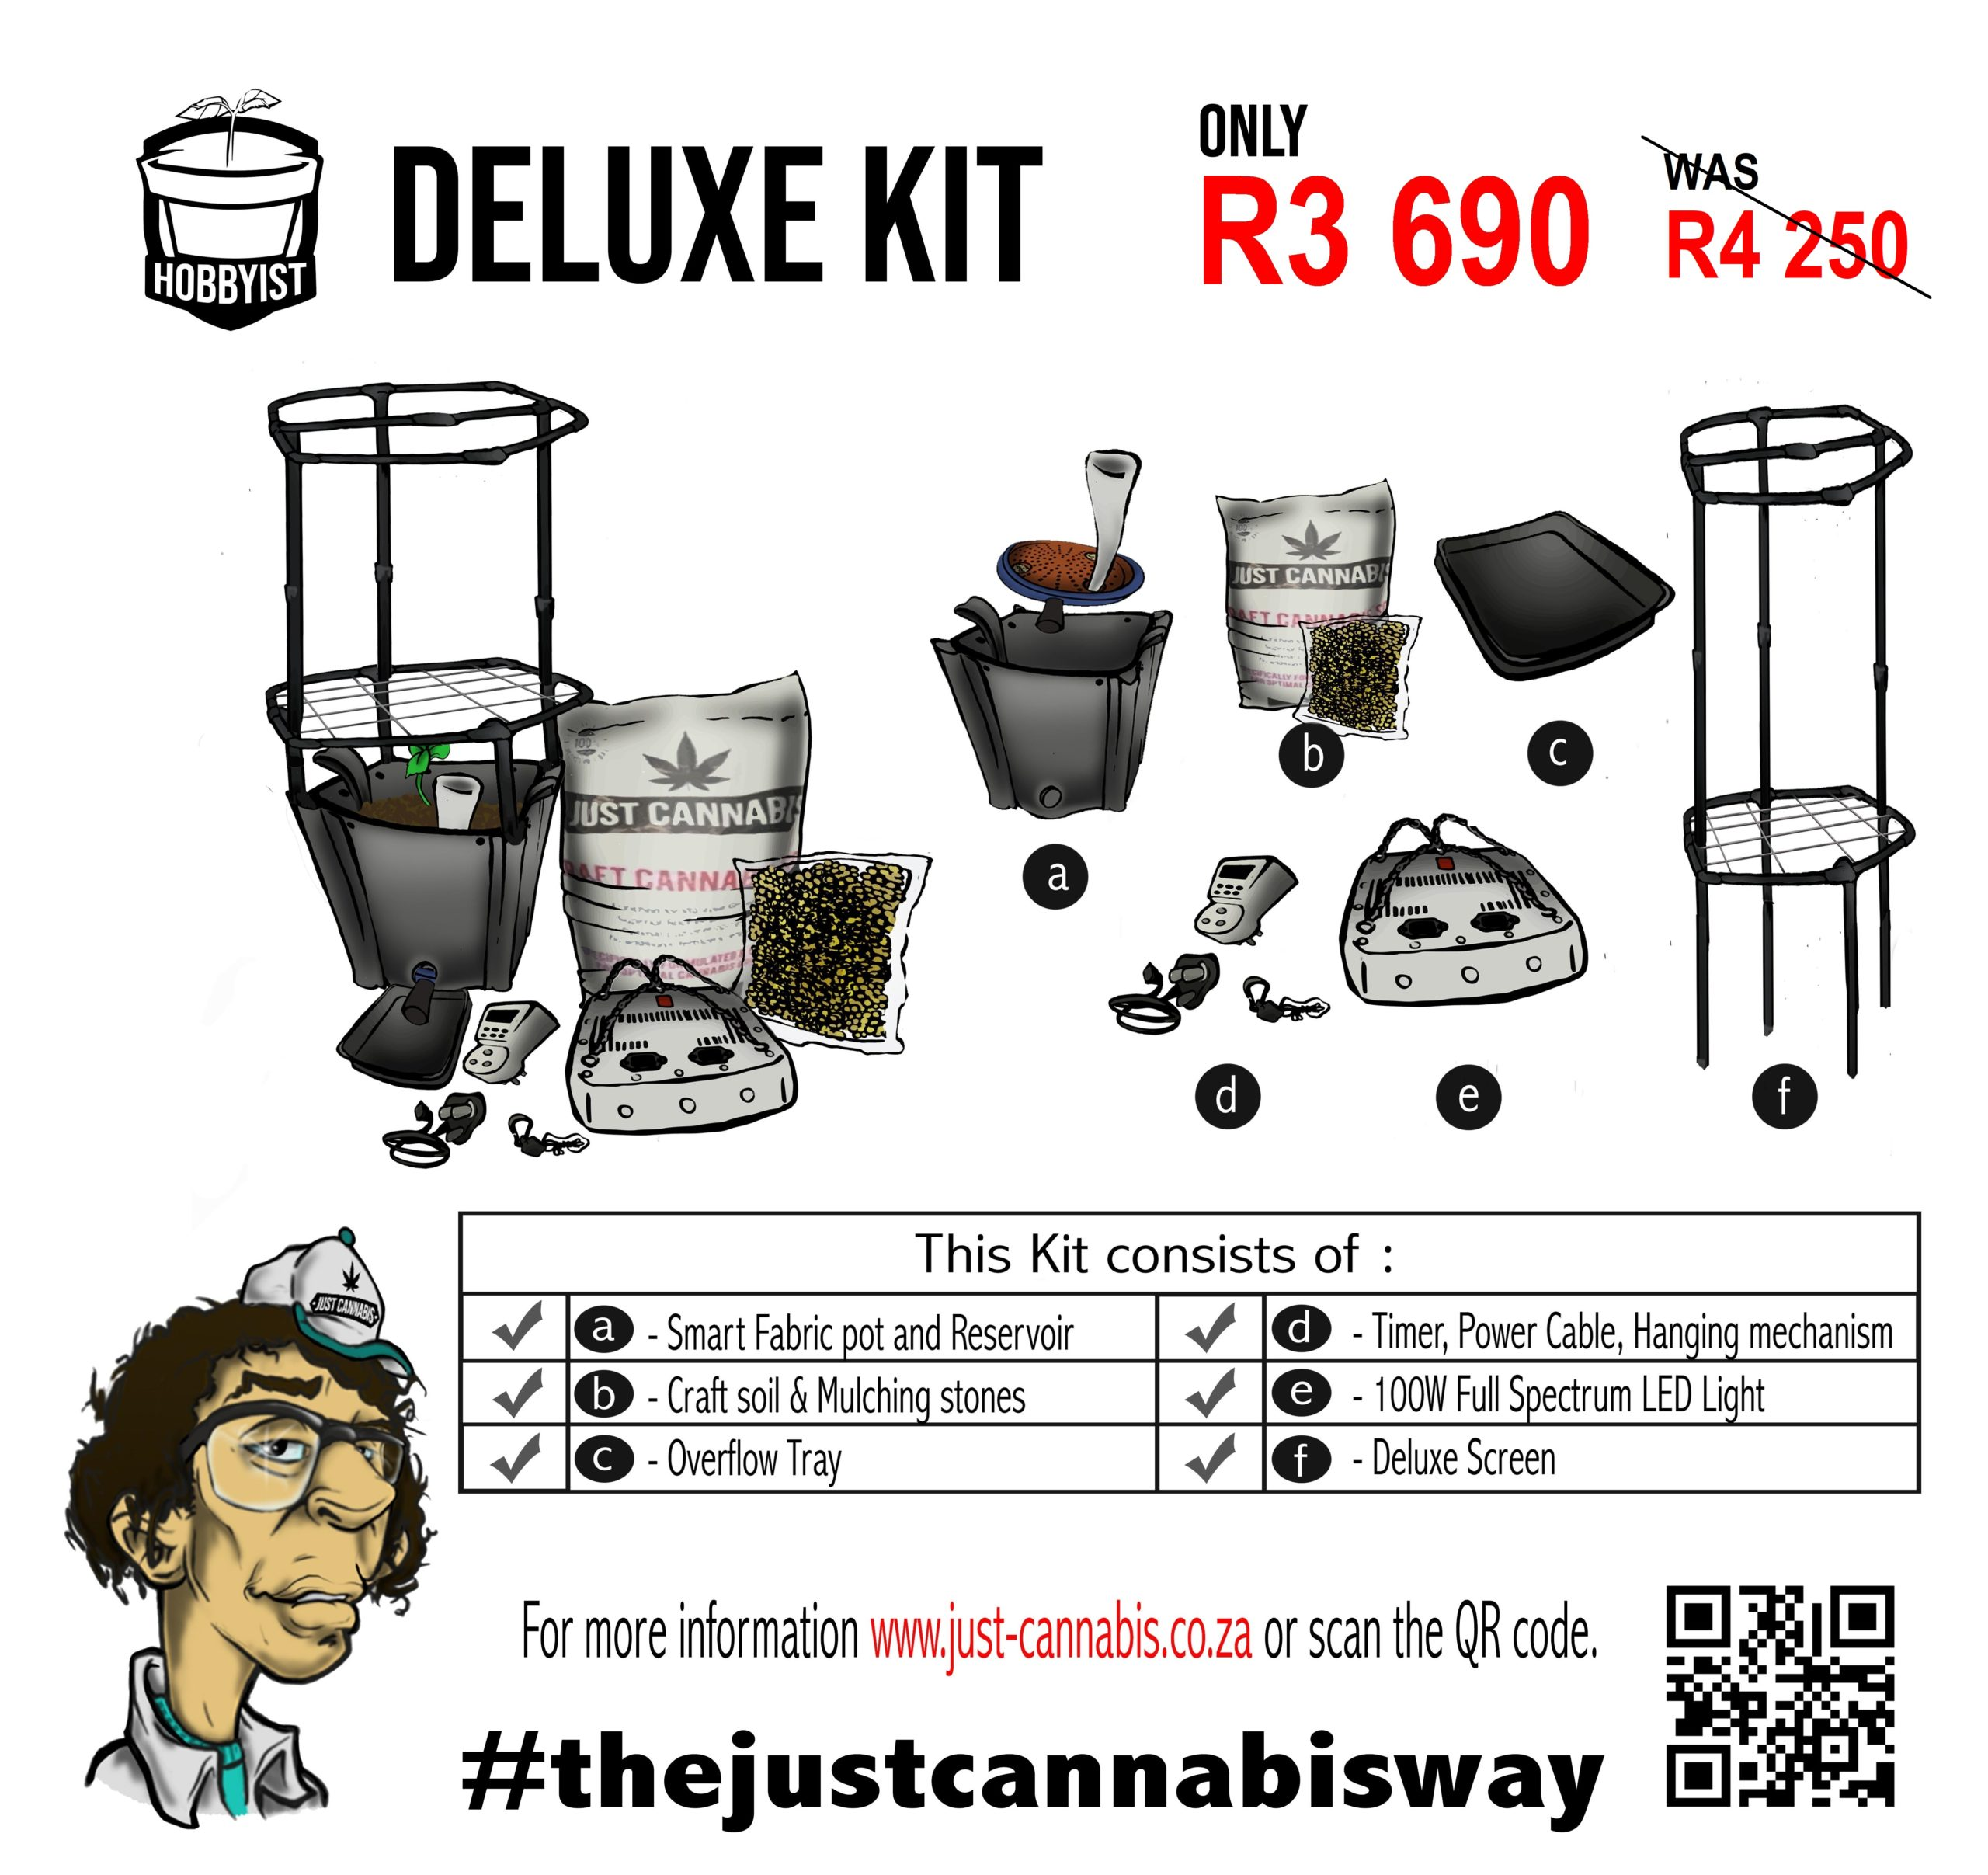 Hobbyist Deluxe Kit